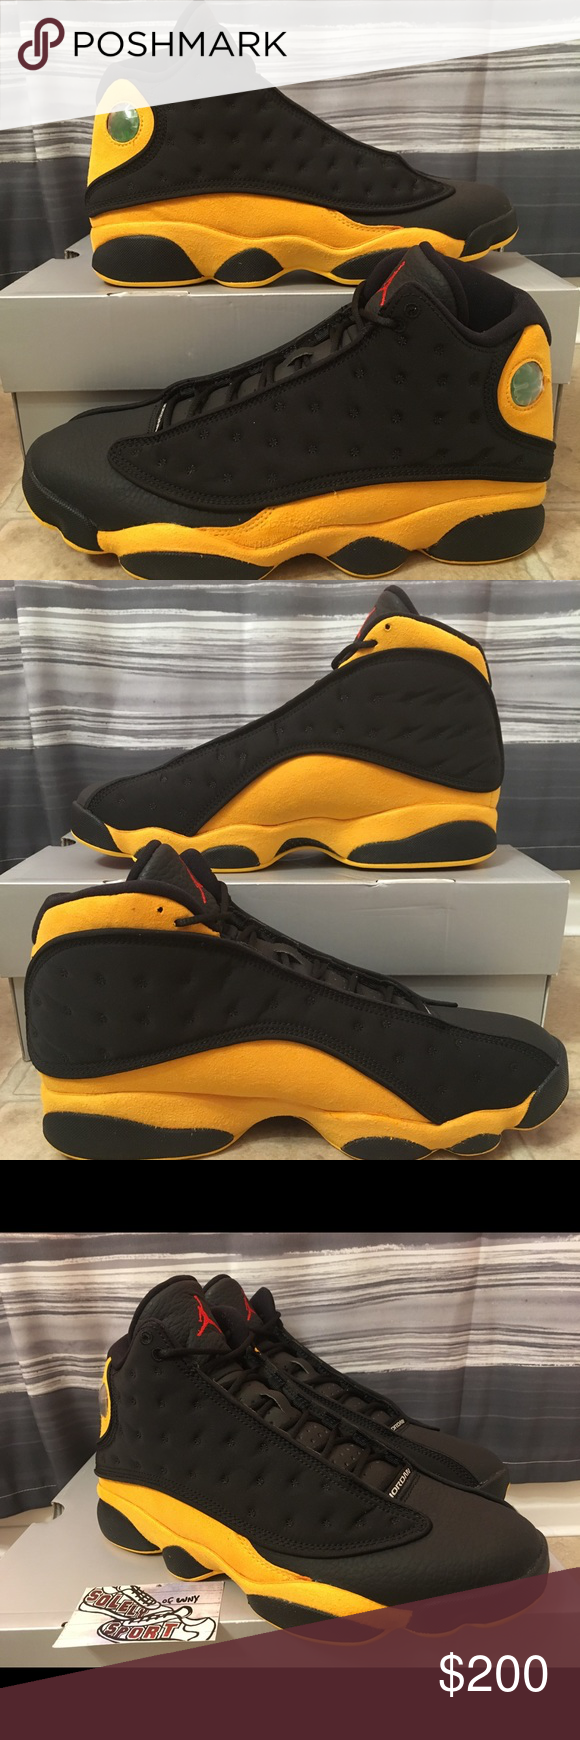 796246155a0 Air Jordan 13 XIII Melo Class of 2002 Yellow Black Brand - Air Jordan Style  -